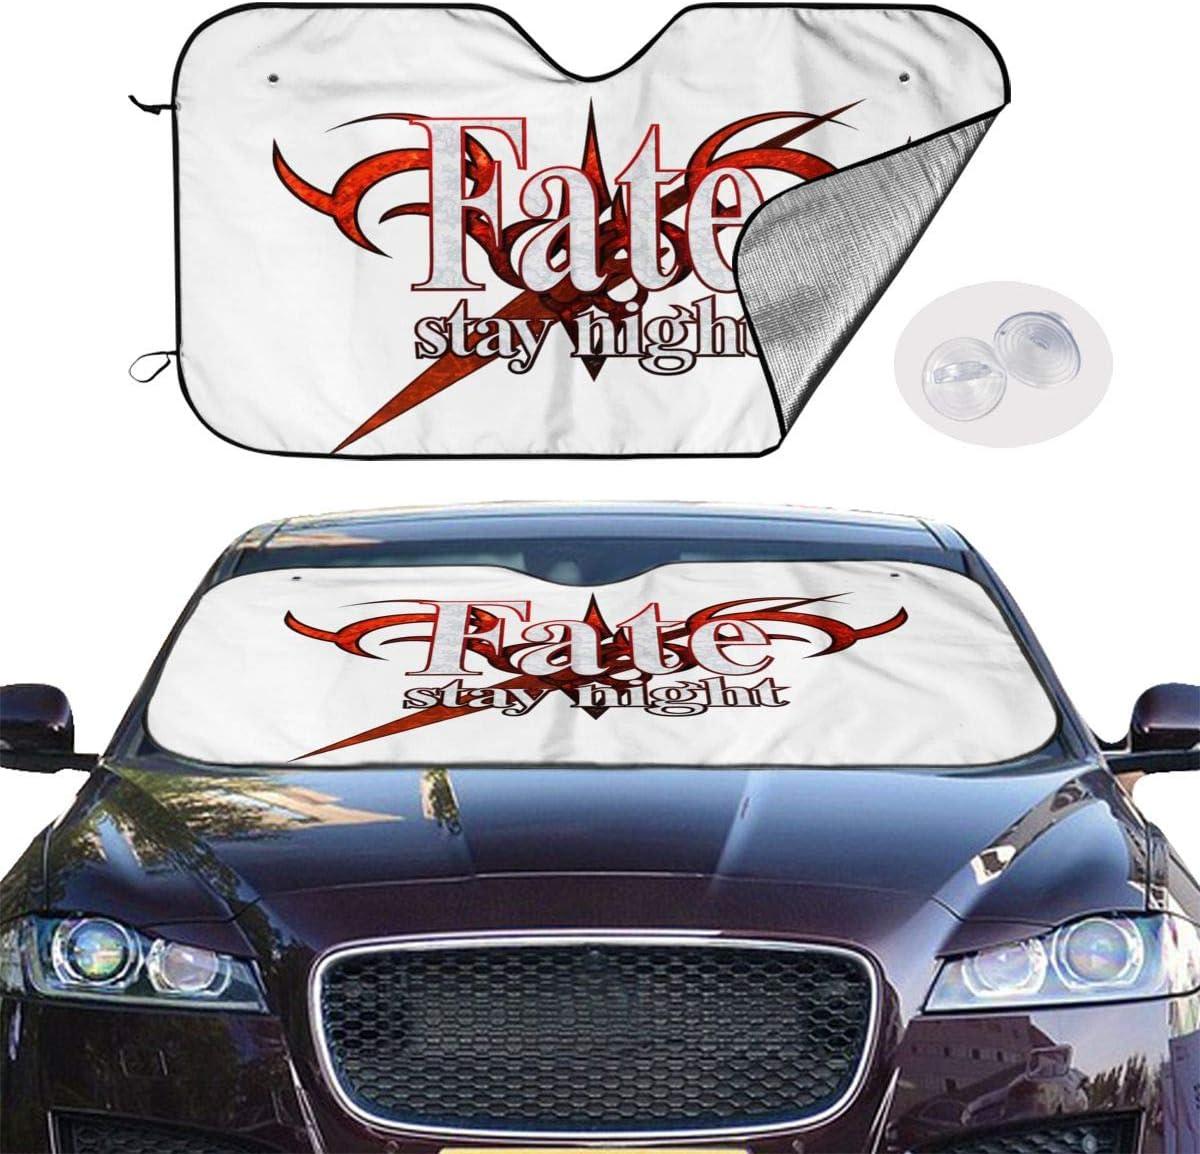 RJ5nrusfwtba Fate Stay Night Folding Custom-Fit Sunshade